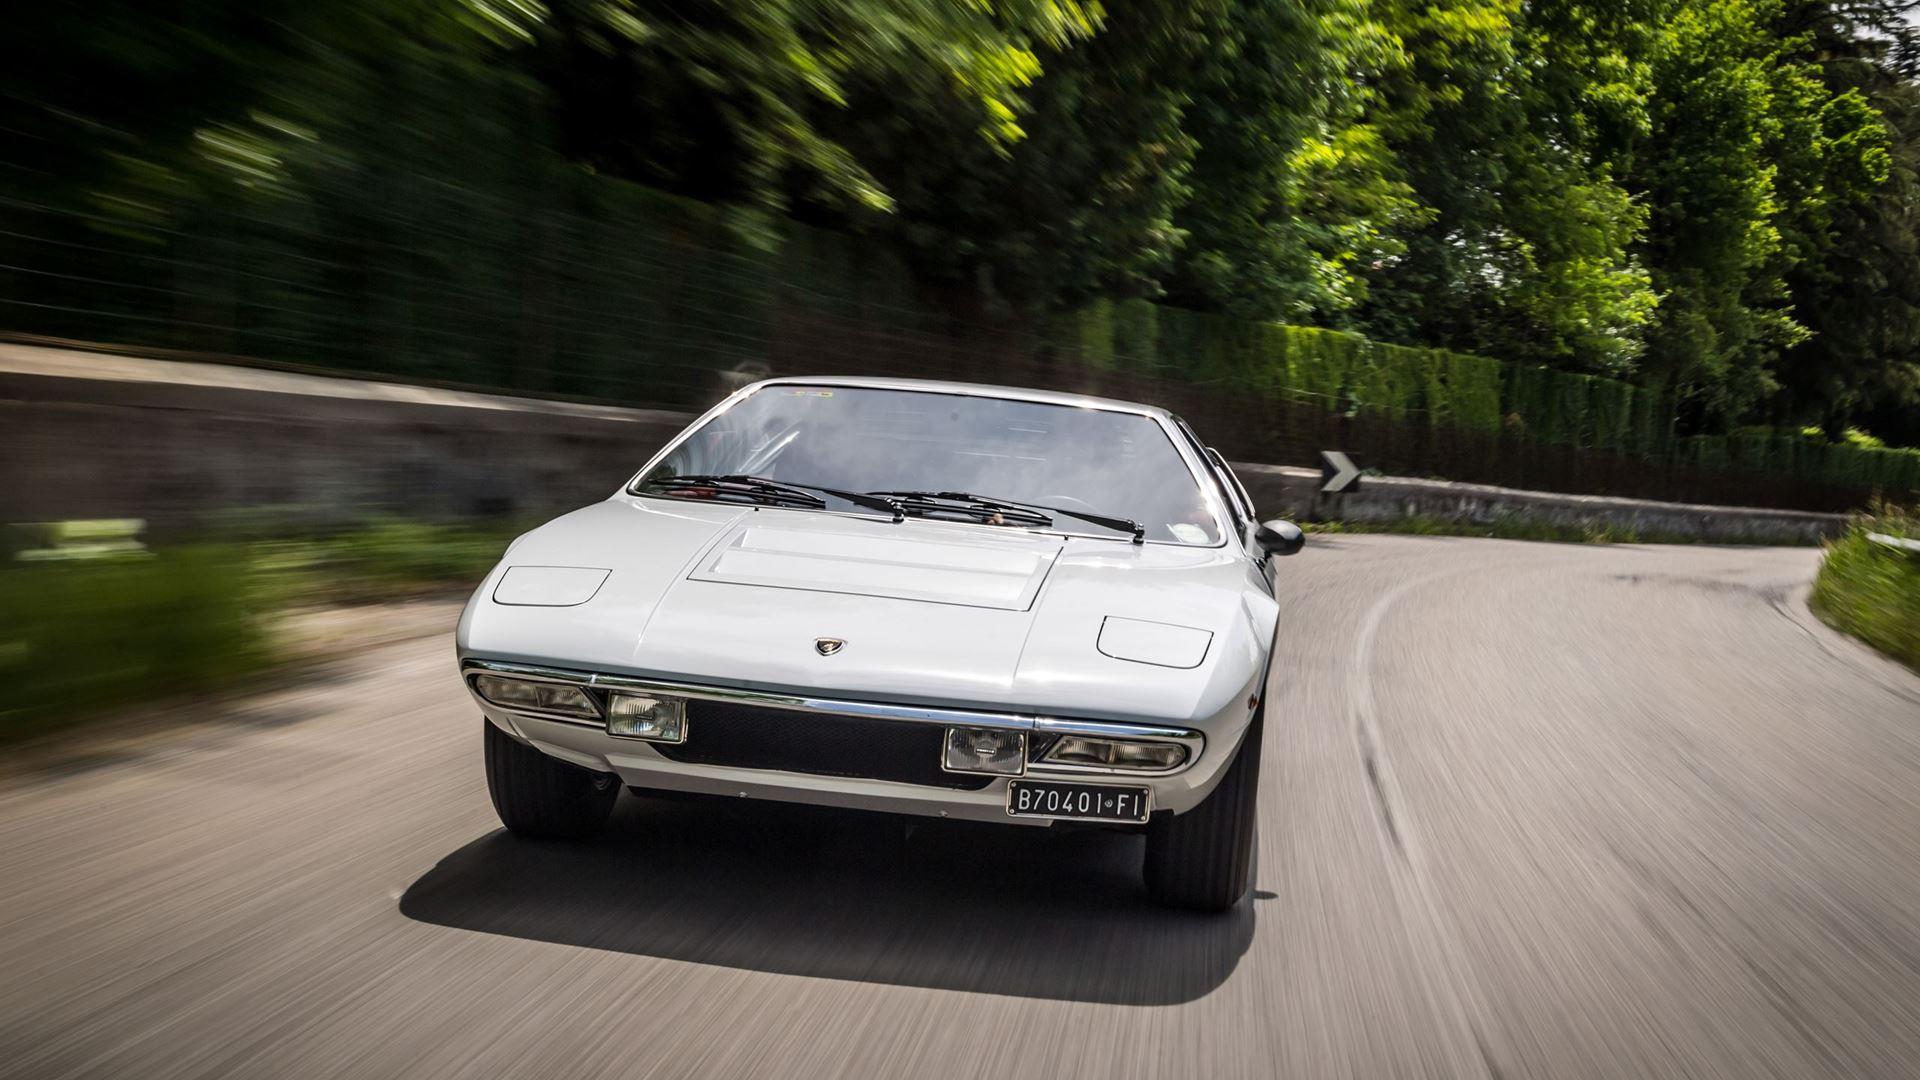 Lamborghini celebrates the 50th Anniversary of the Urraco - Image 6